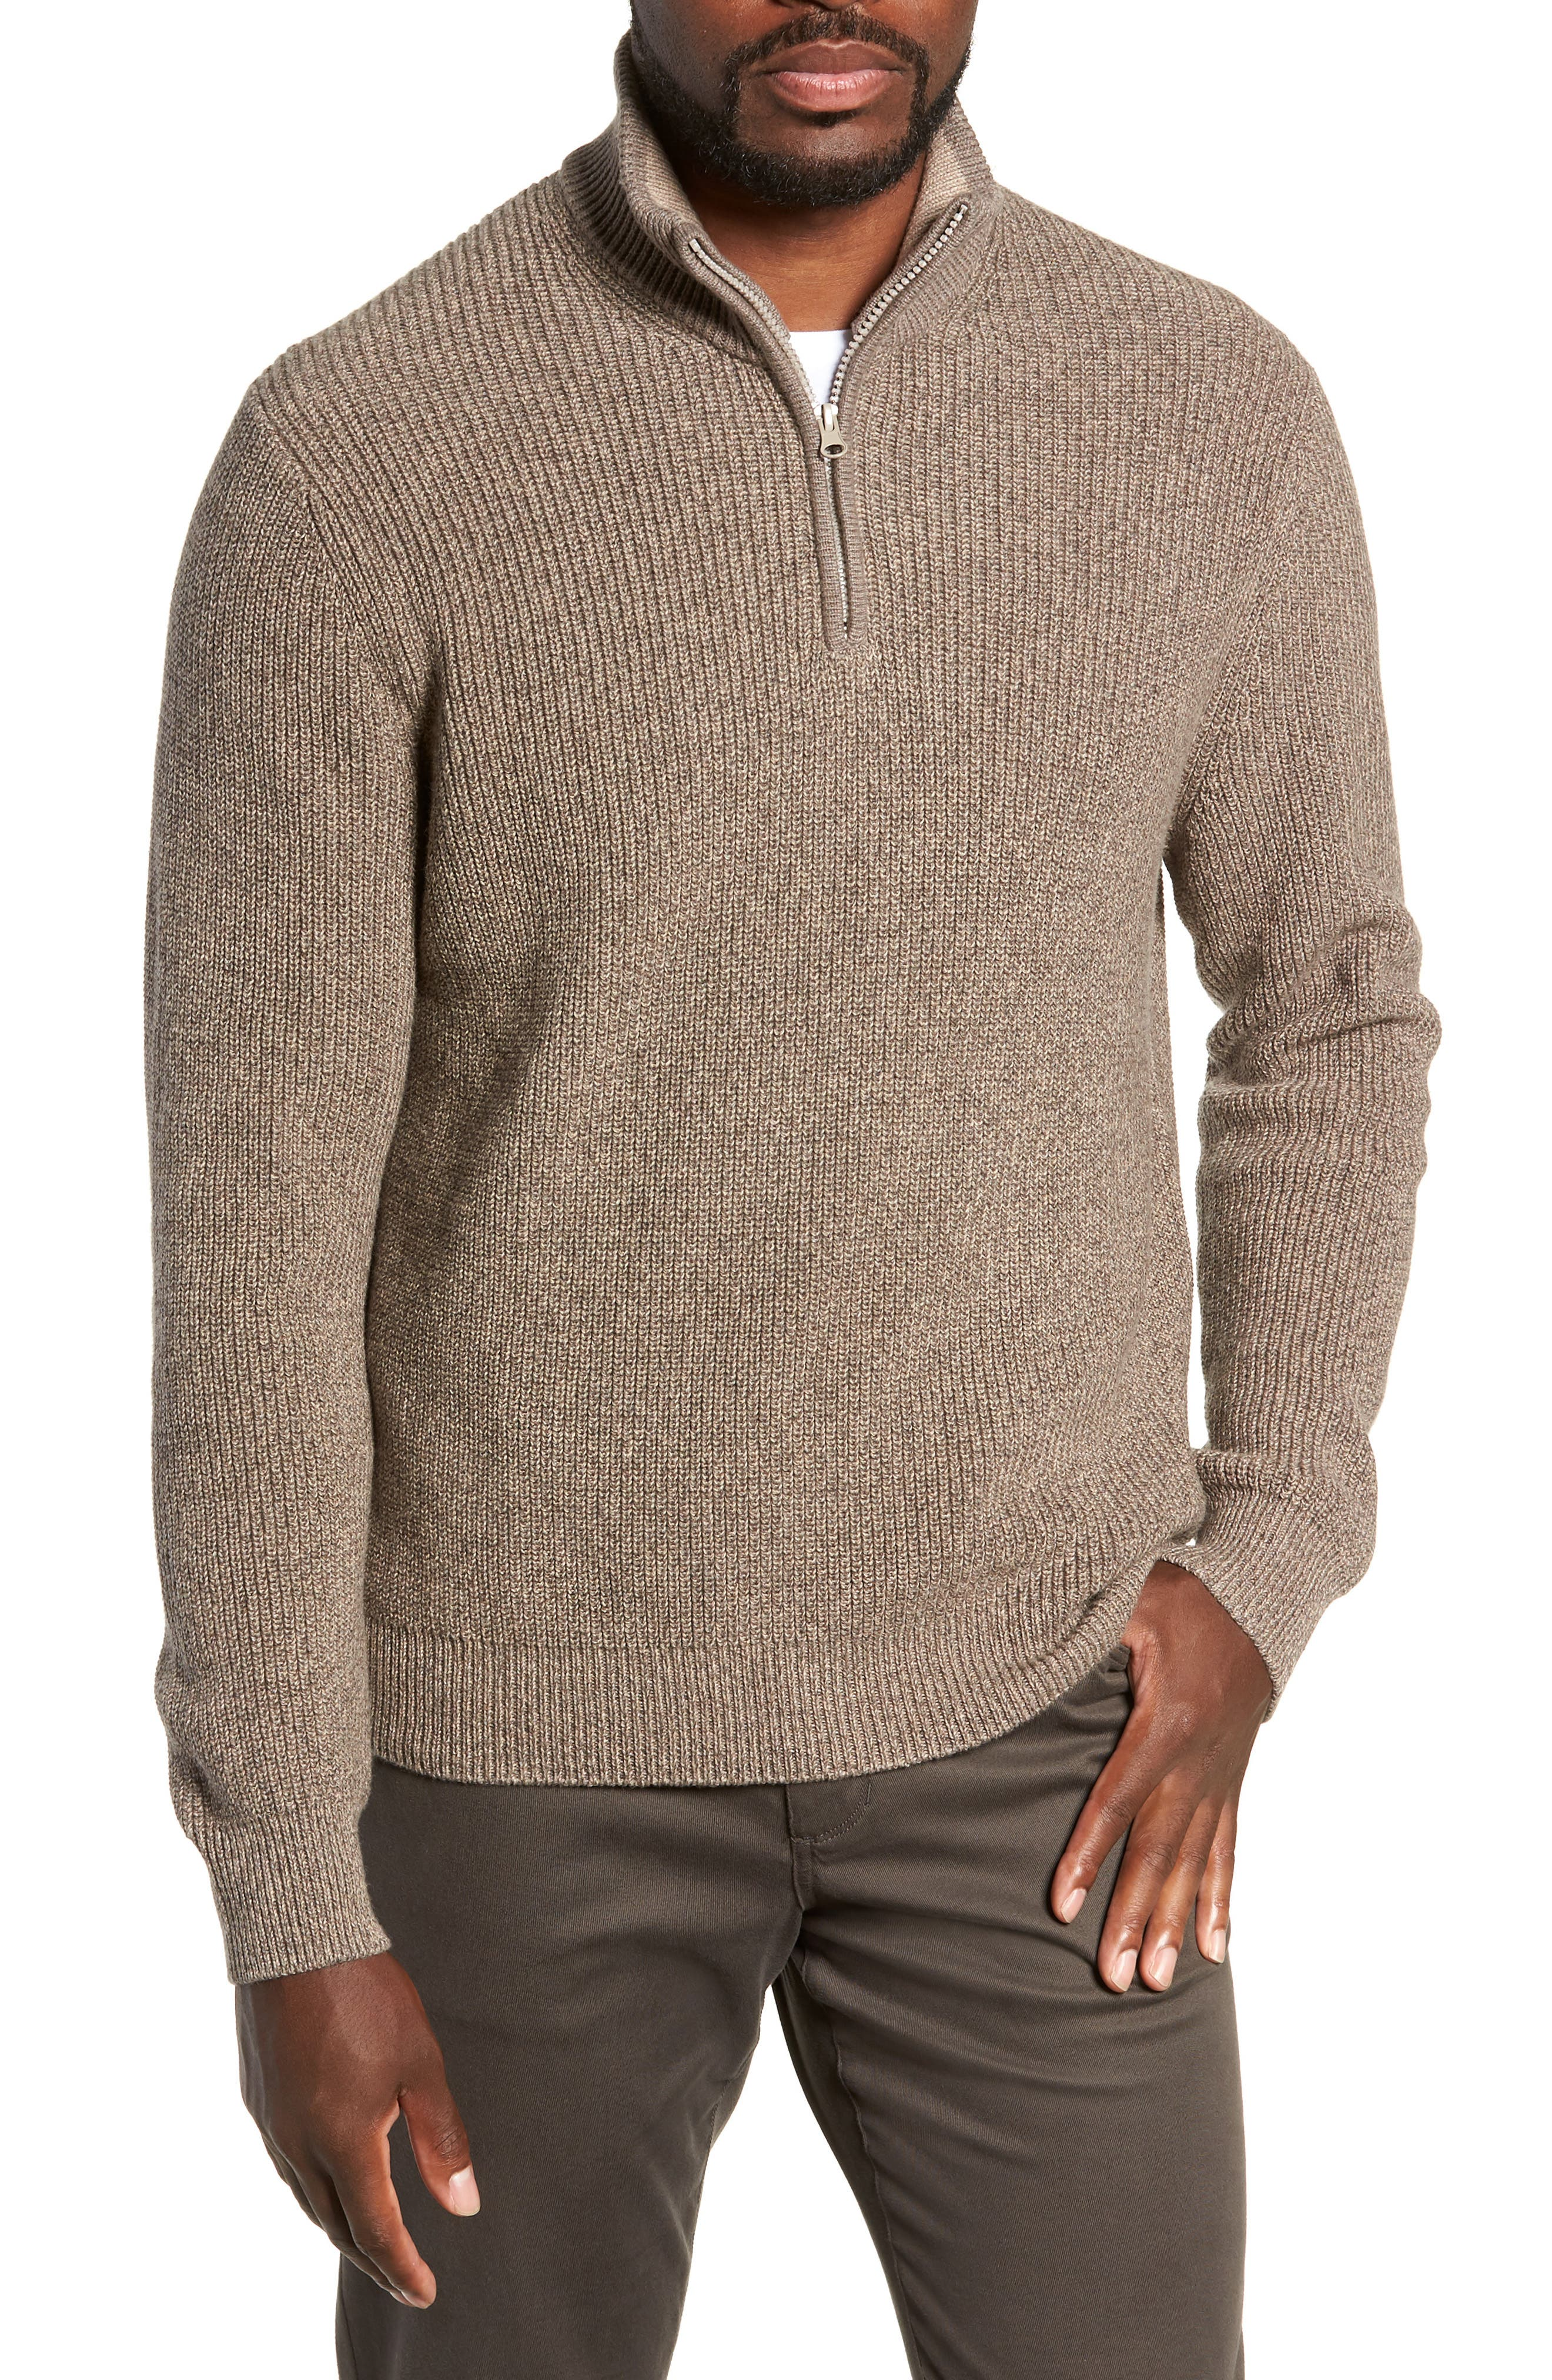 ZACHARY PRELL Fillmore Quarter Zip Sweater in Sand